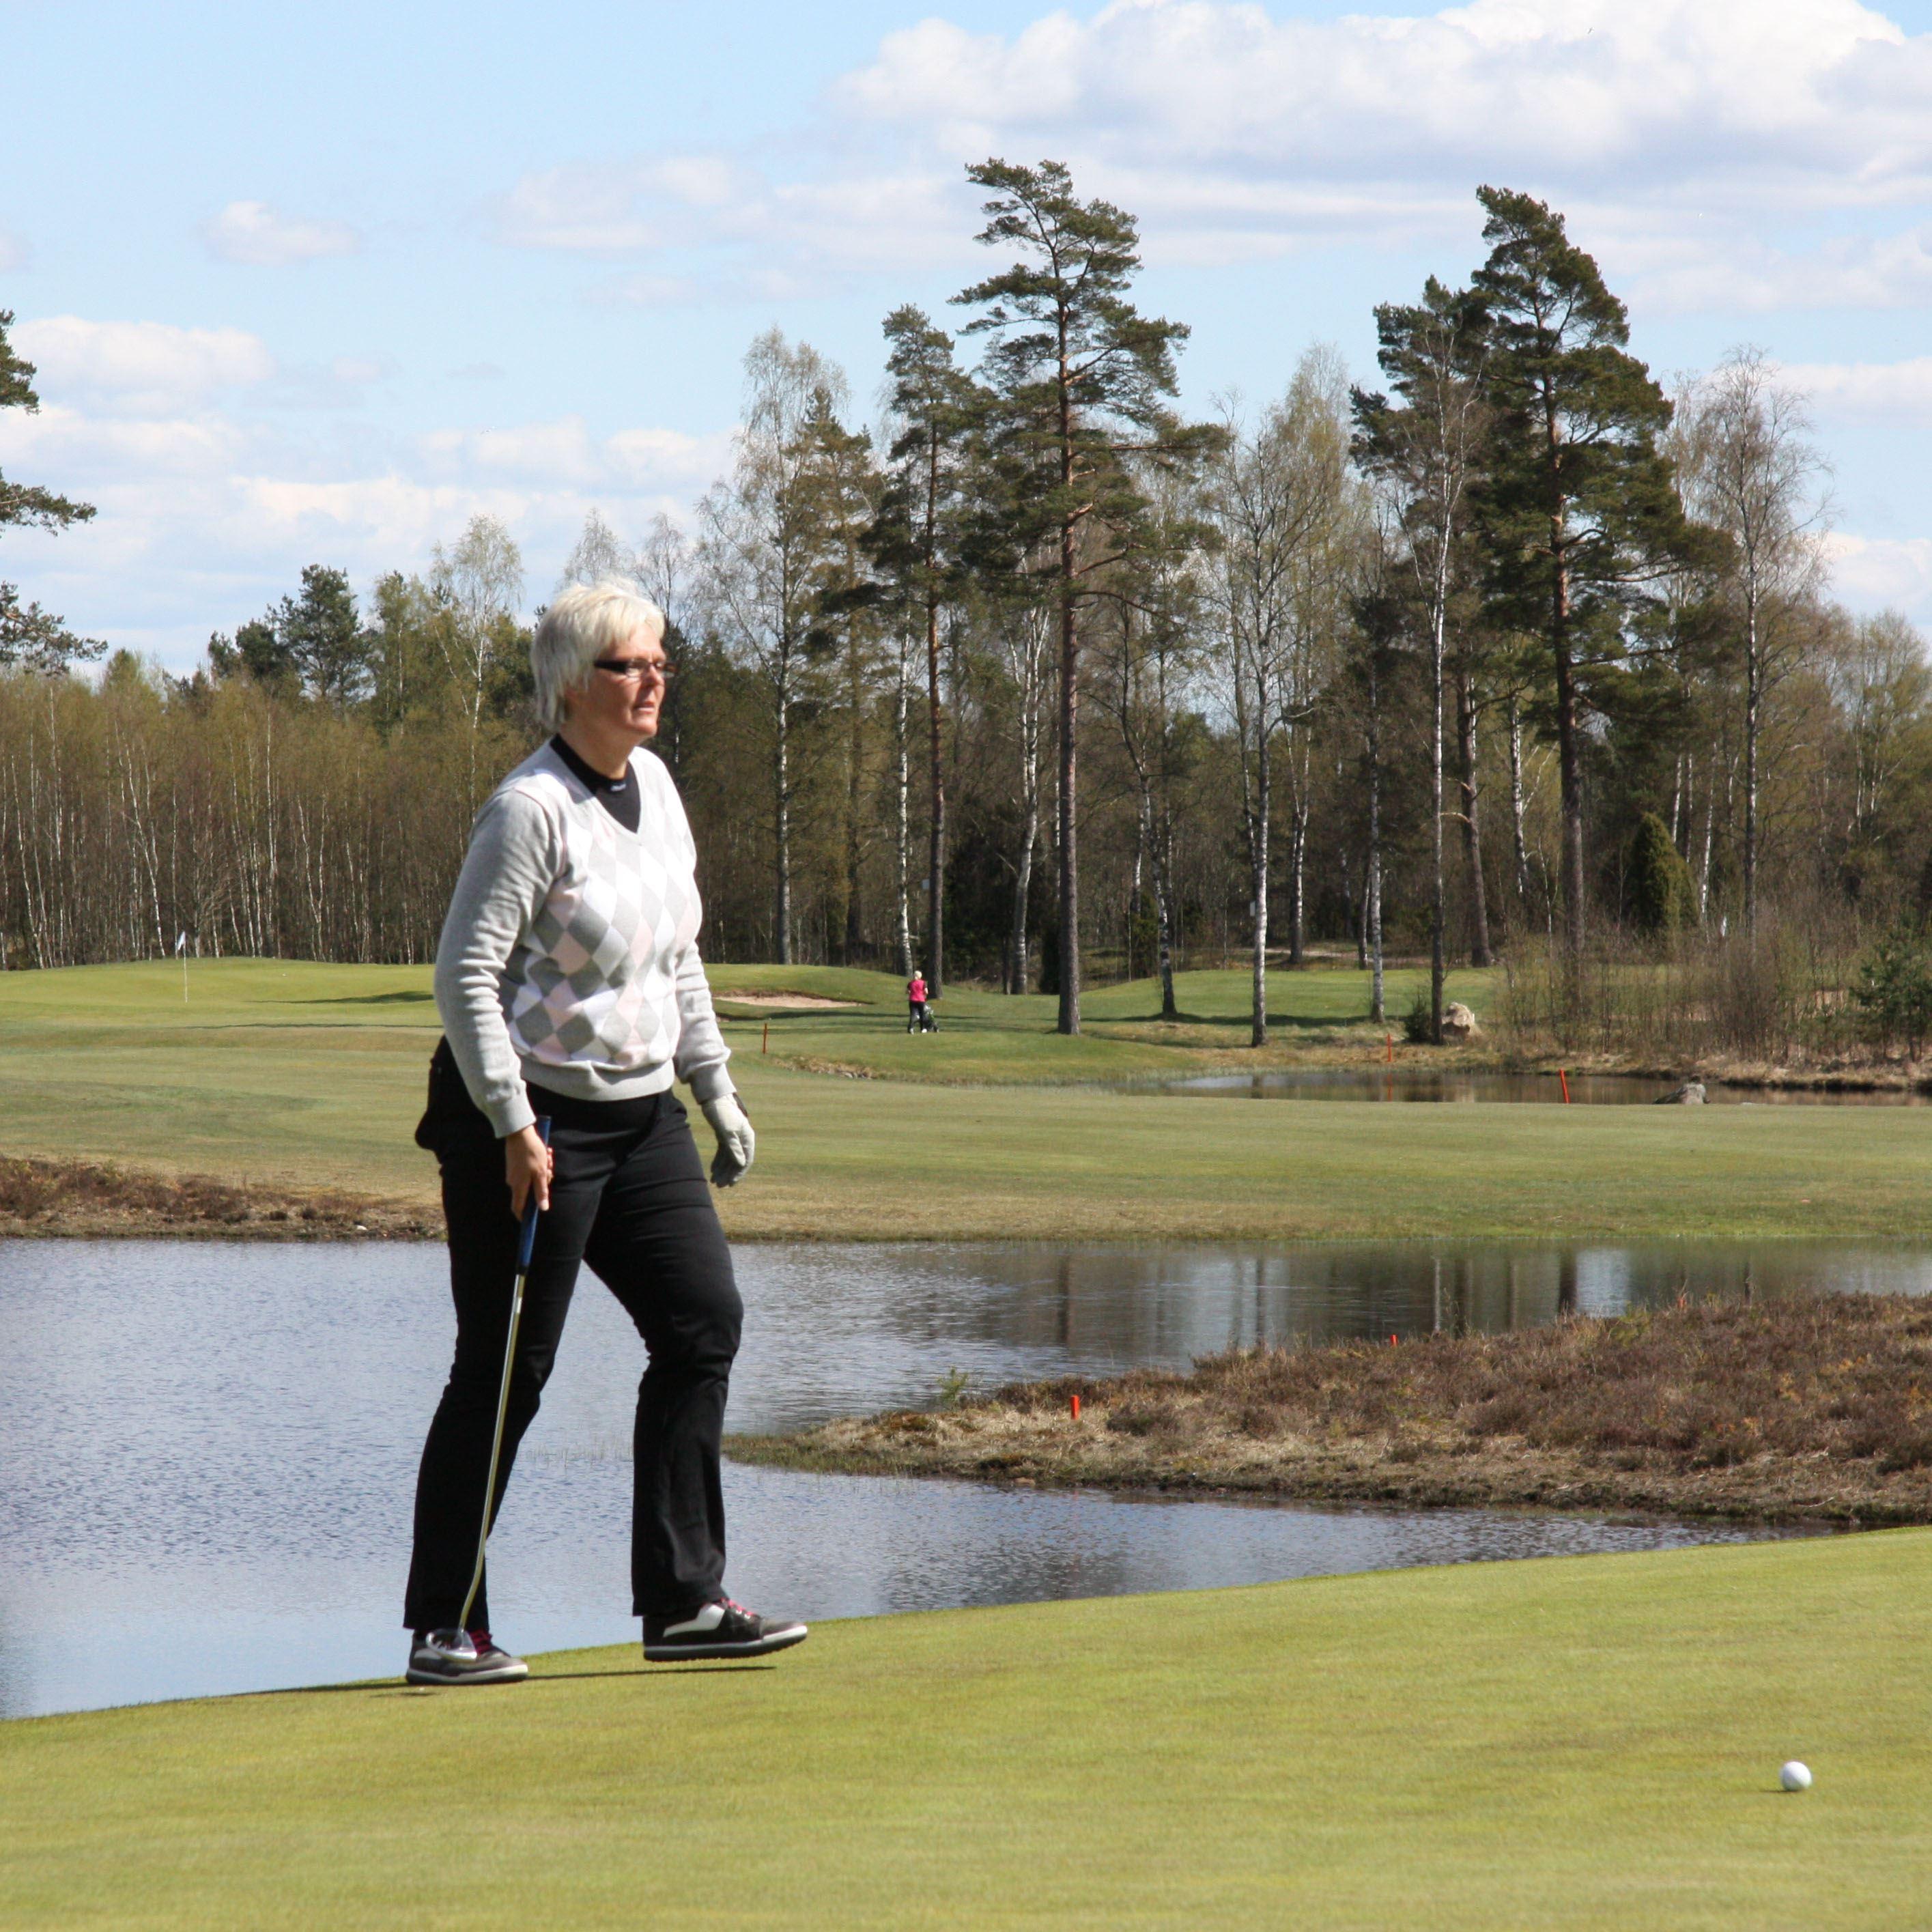 Lagans GK, Lagans Golfklubb